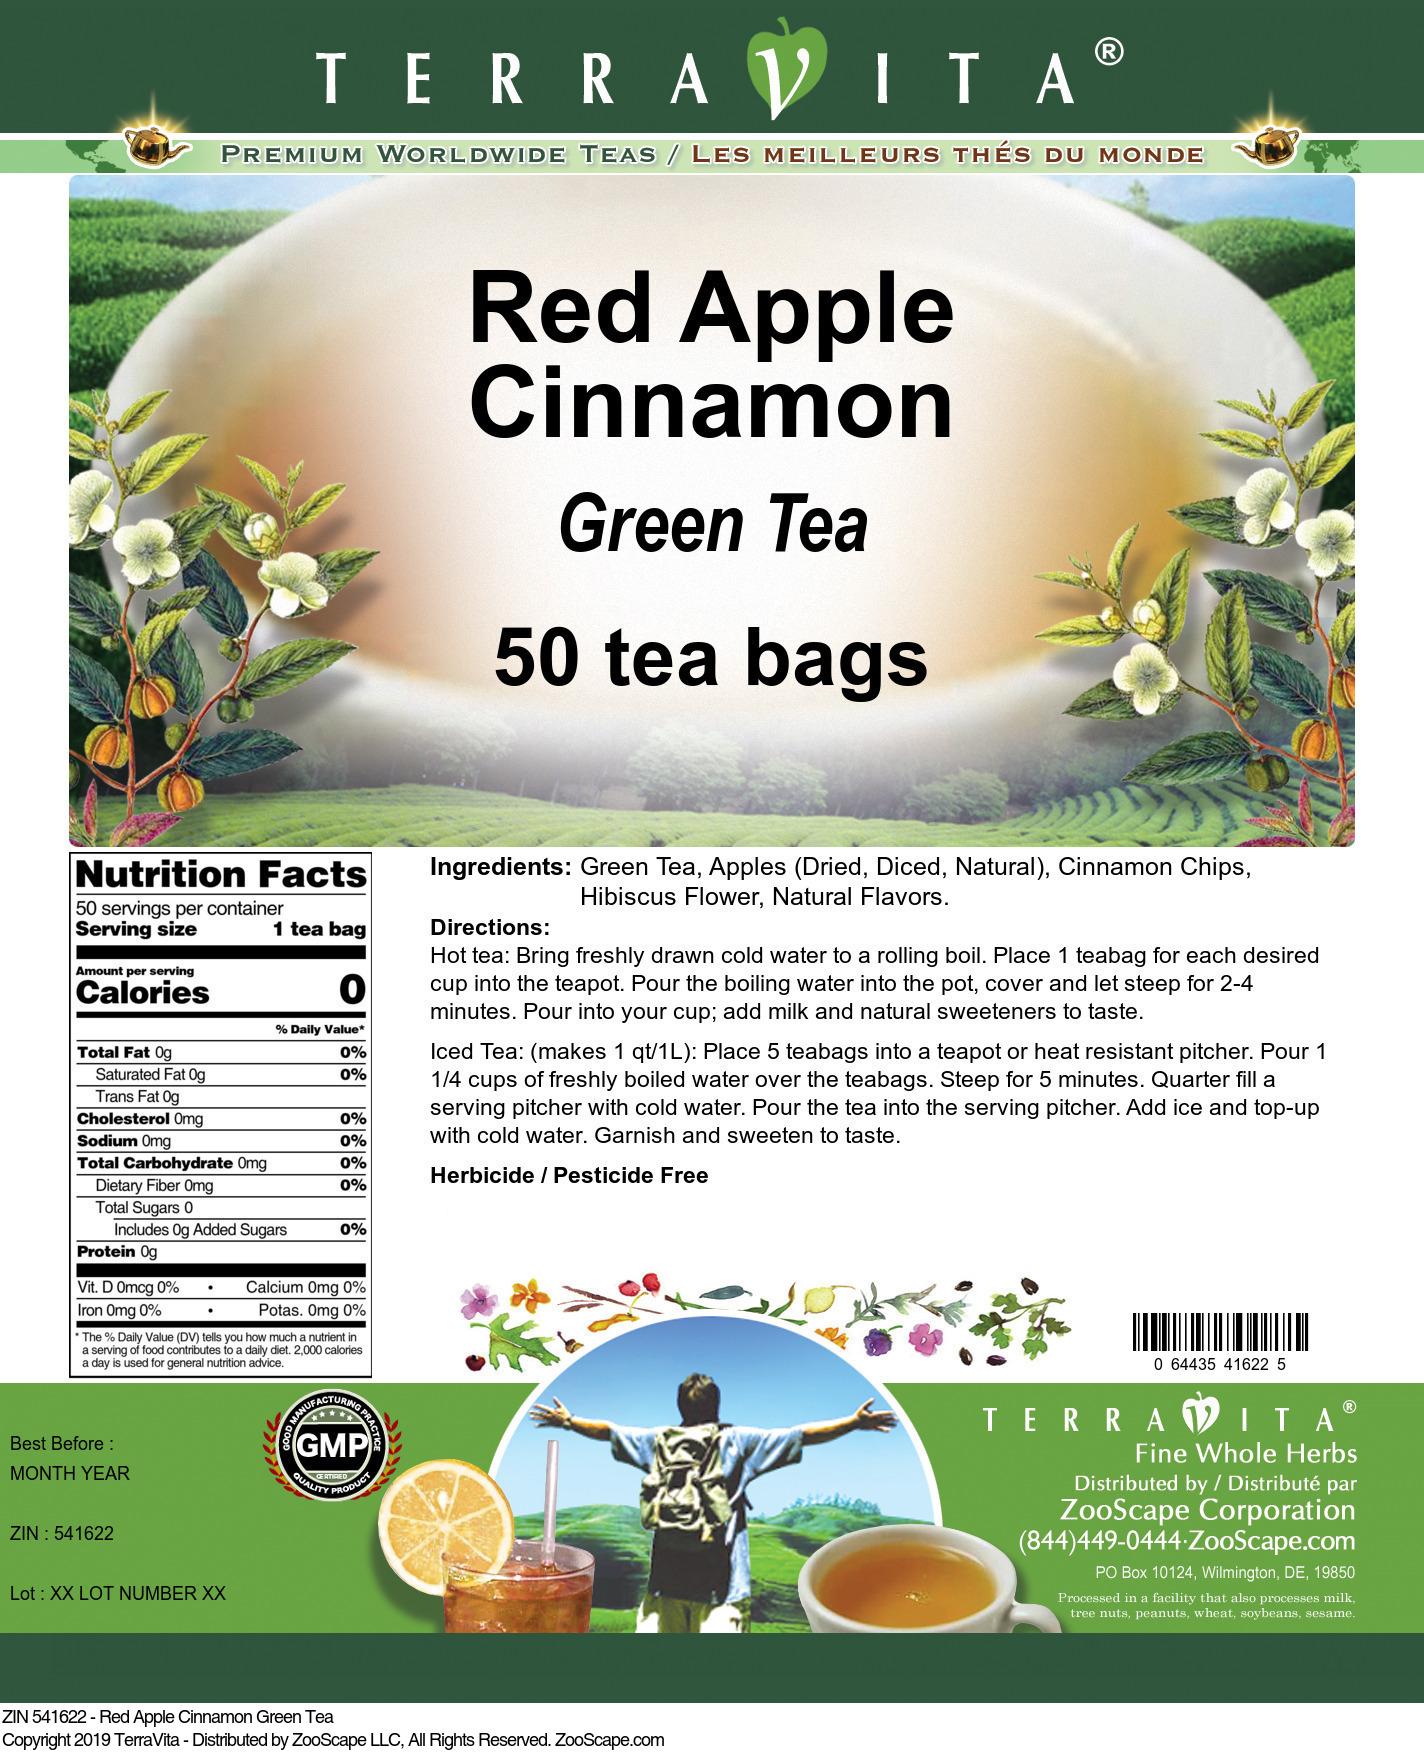 Red Apple Cinnamon Green Tea